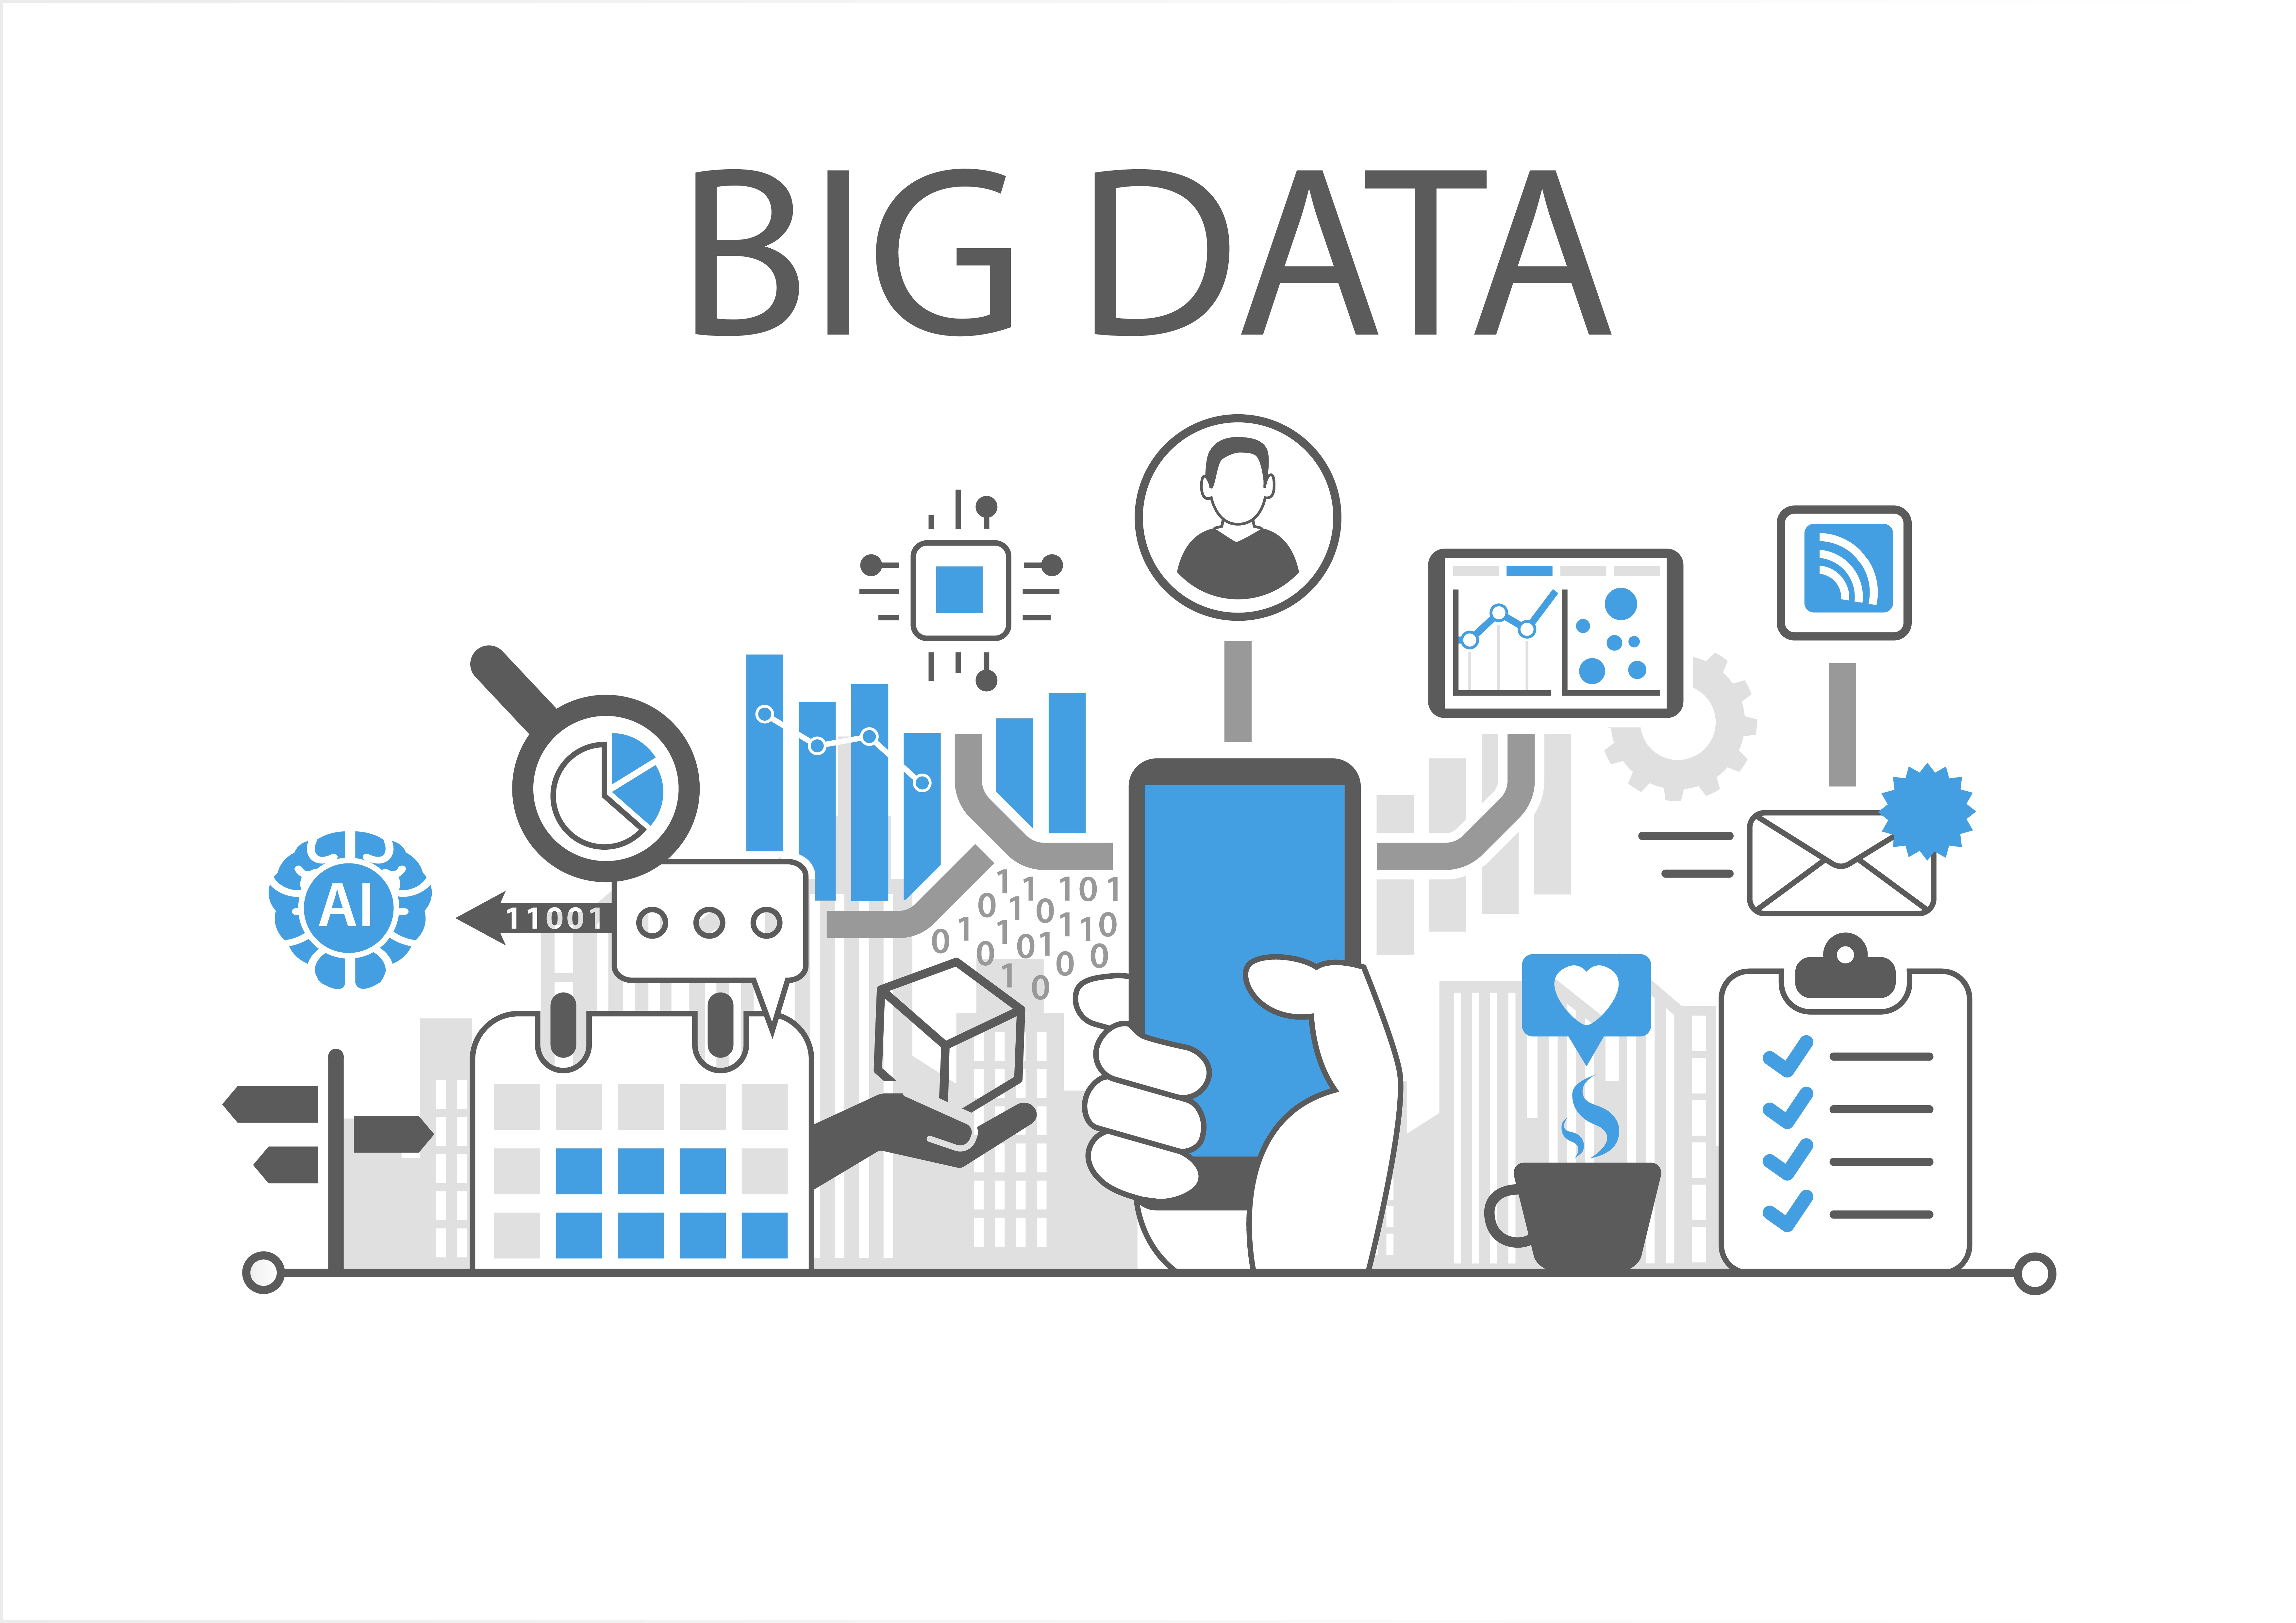 Big Data isn't just for big companies